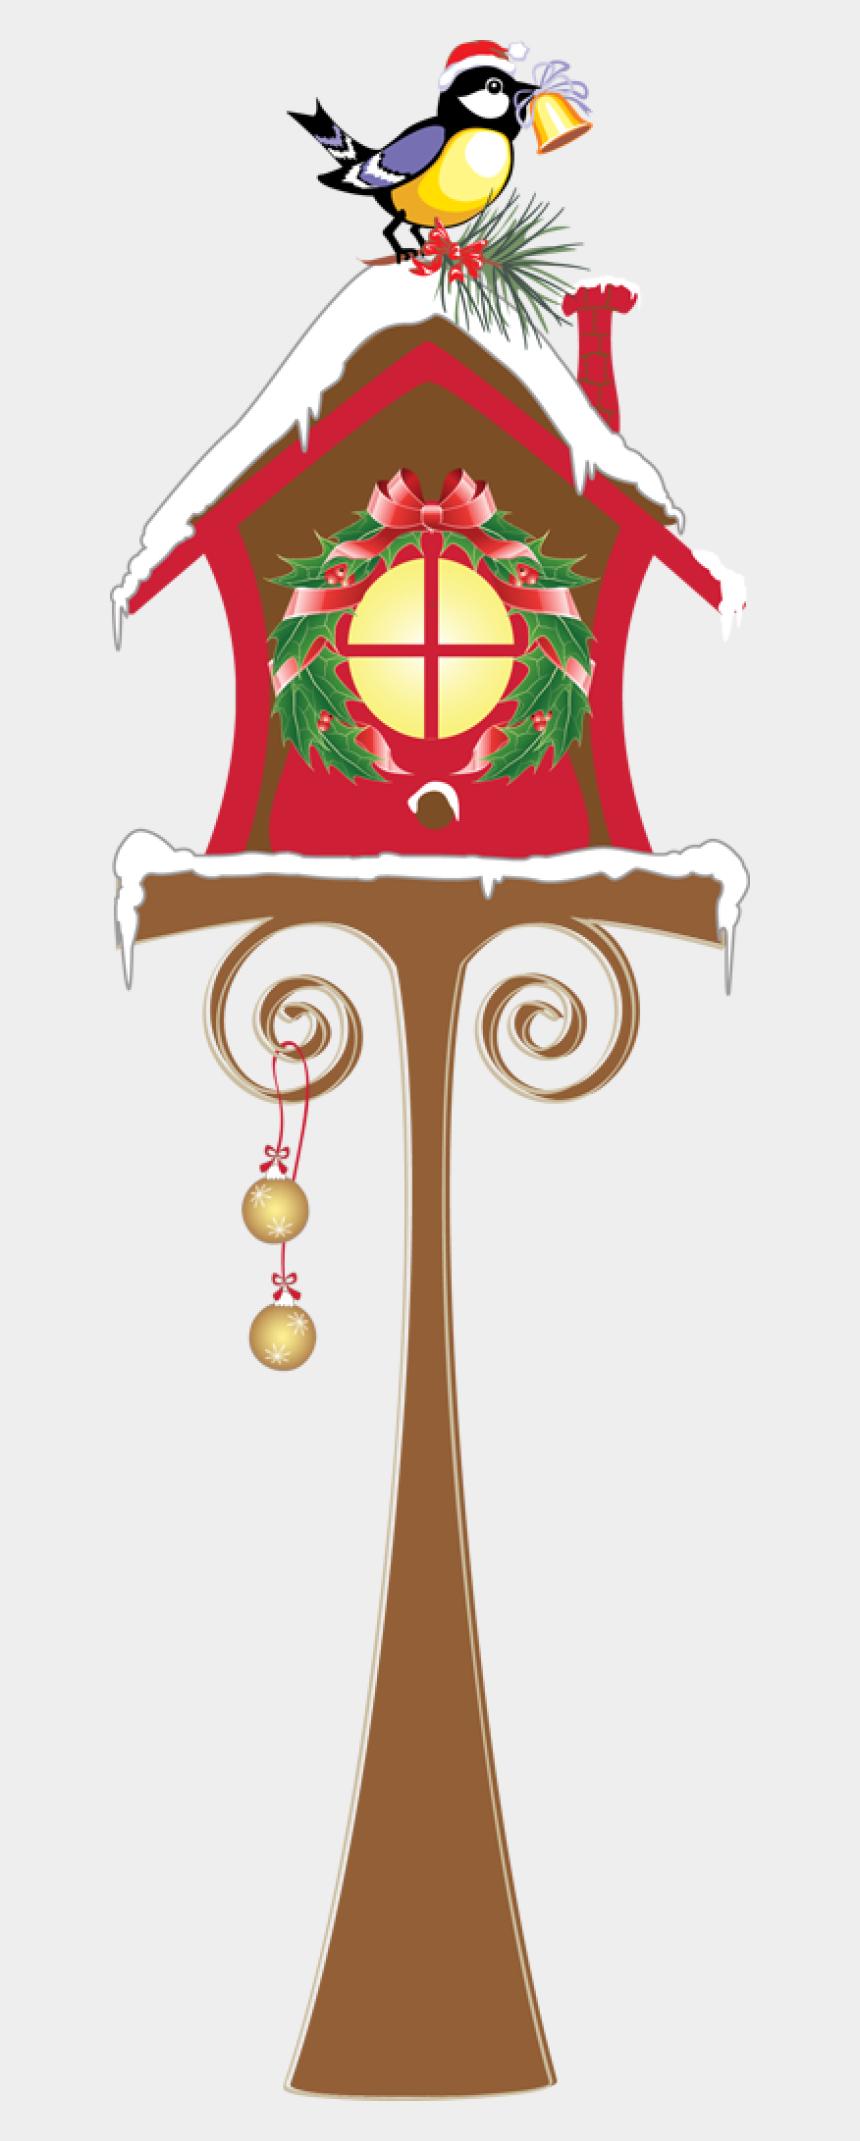 bird house clipart, Cartoons - Bird House Clipart Primitive - Cute Christmas Mailbox Clip Art